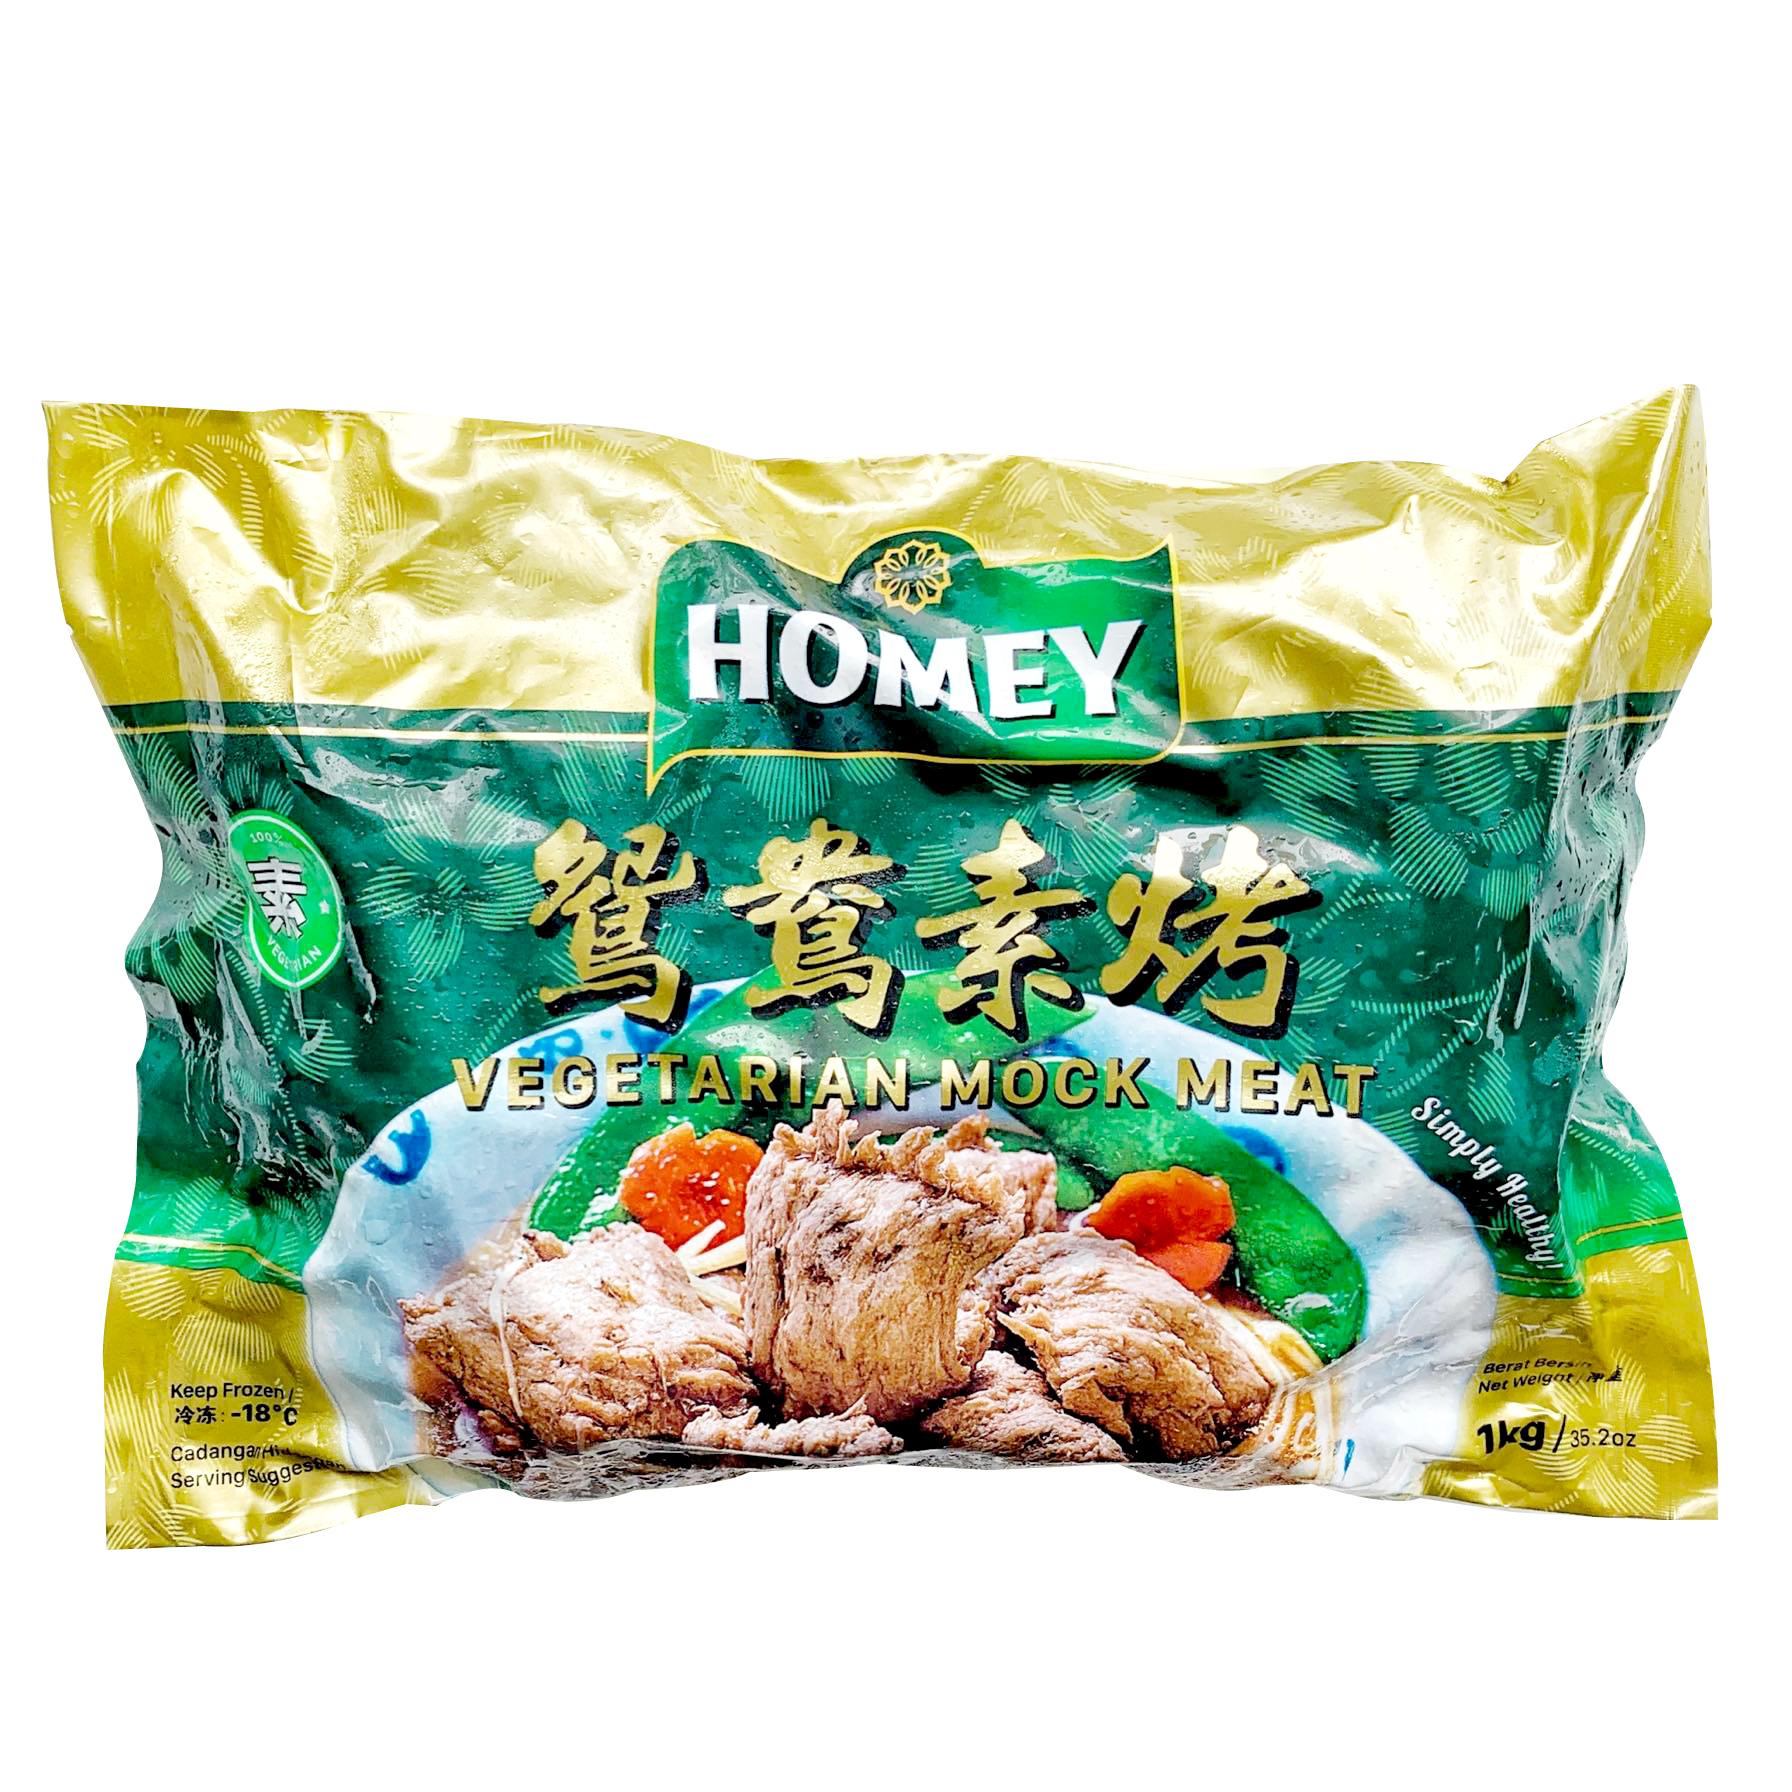 Image Veg Mock Meat 立德 - 鸳鸯素烤 1000grams